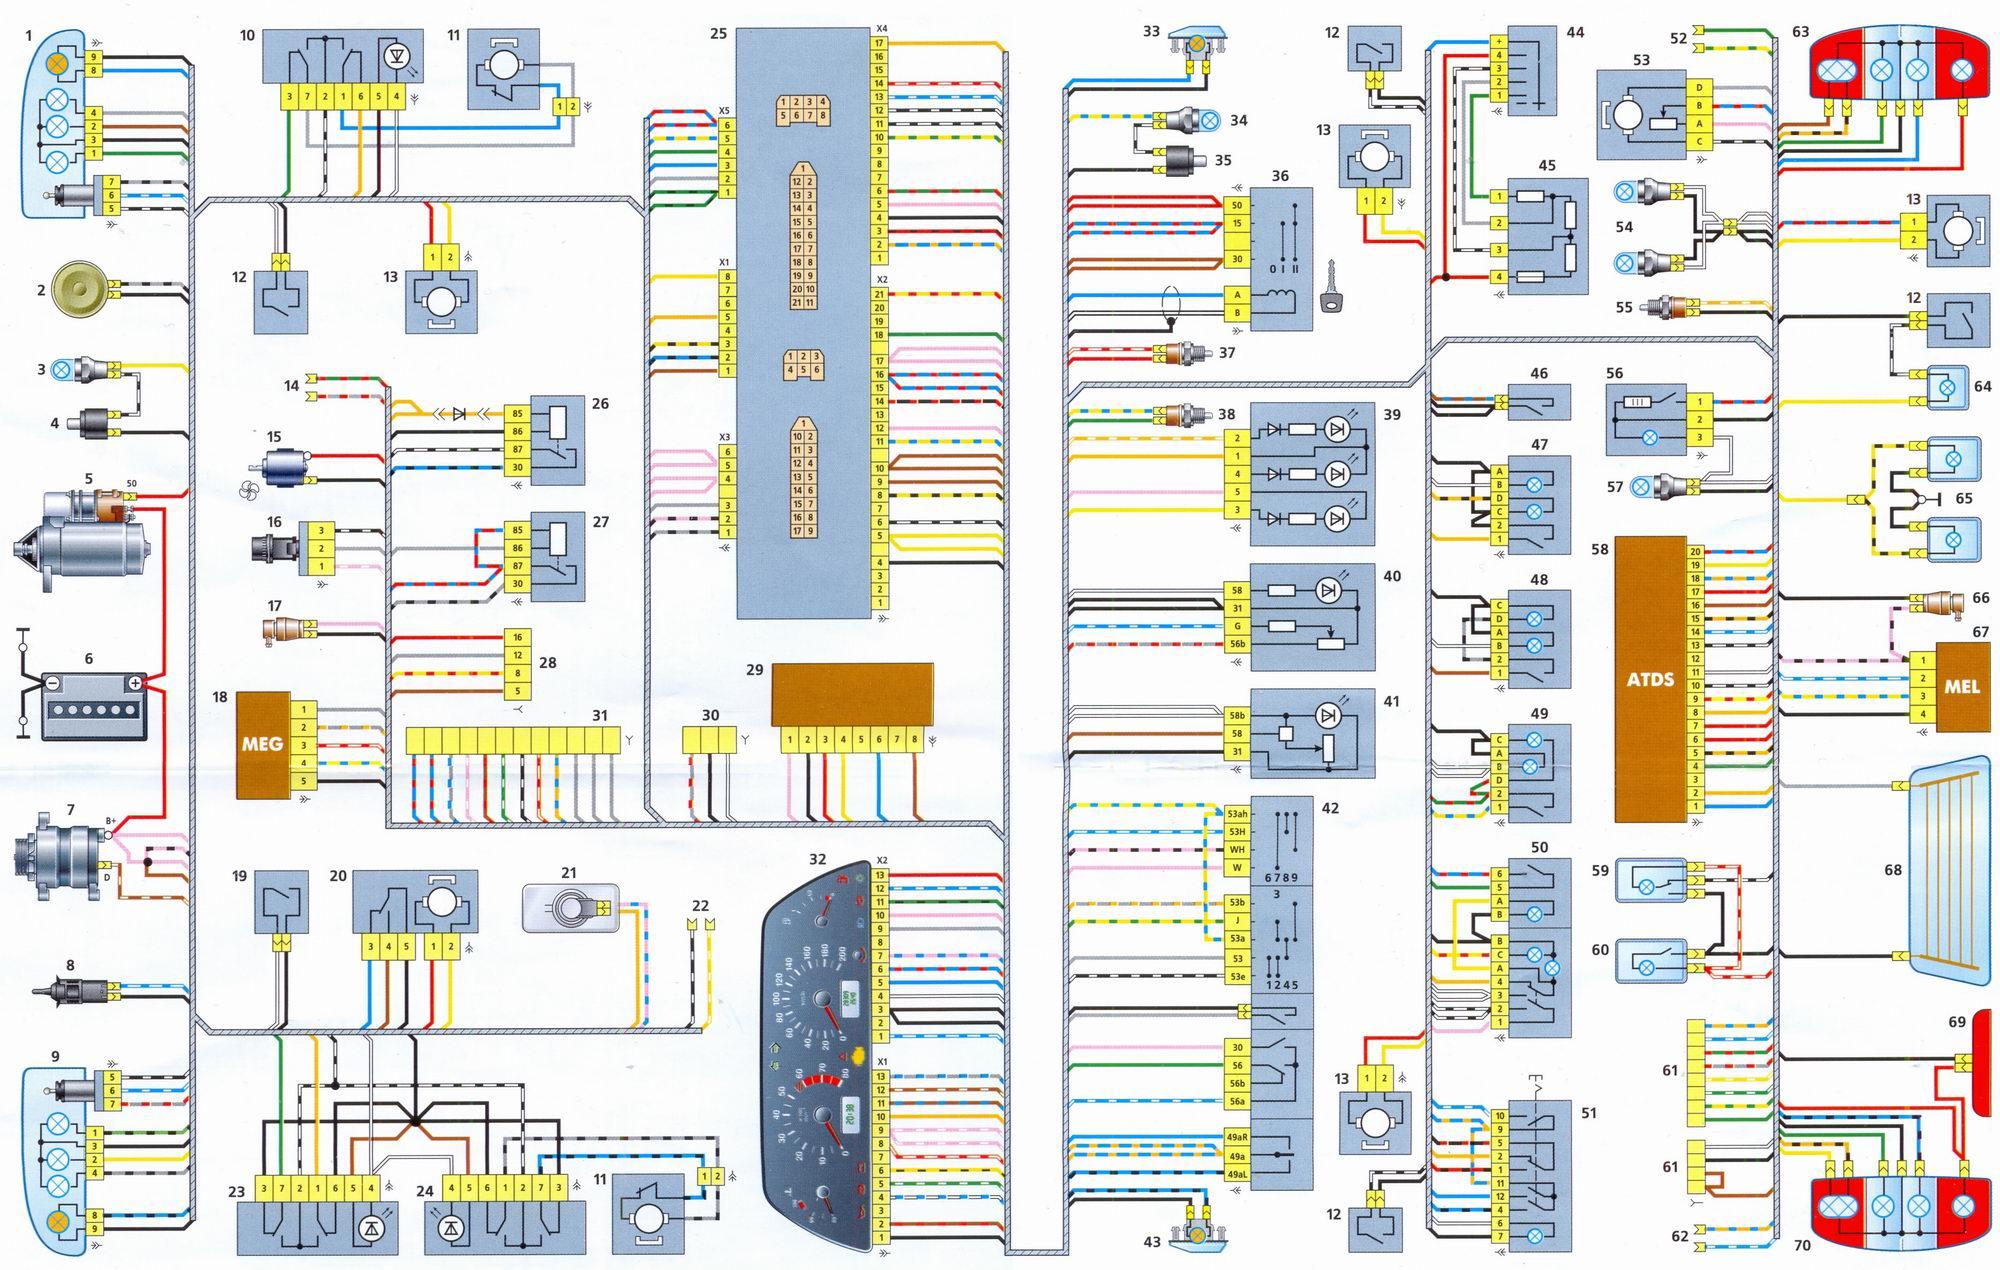 Схема электрооборудования шевроле нива (Chevrolet Niva)Схема электрооборудования шевроле нива (Chevrolet Niva)...